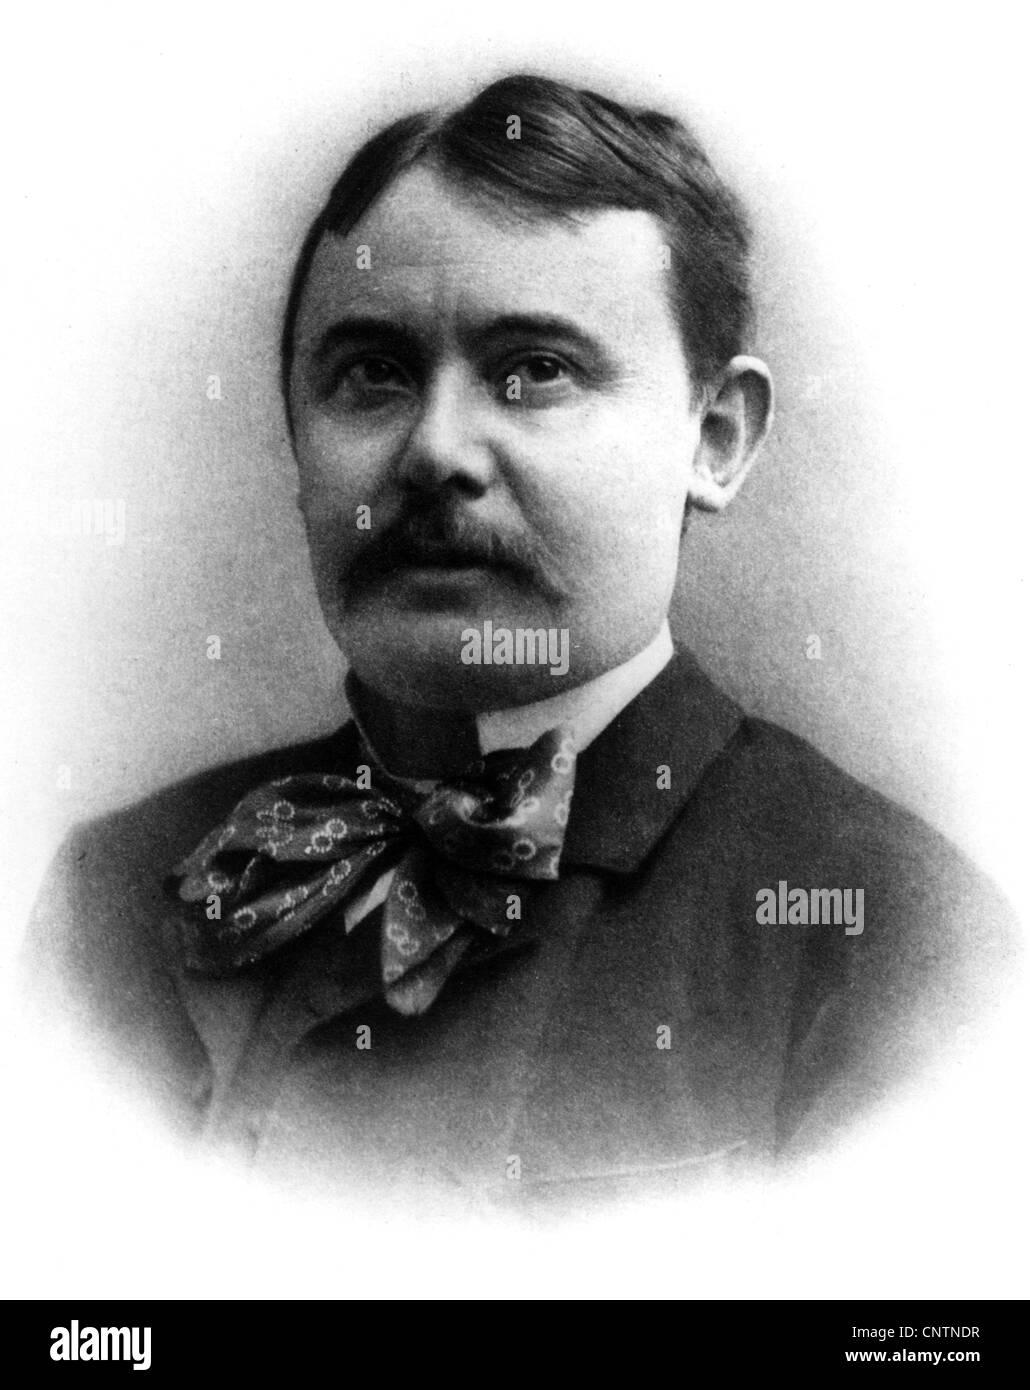 Mikszath, Kalman, 16.1.1847 - 28.5.1910, Hungarian author / writer, portrait, photograph, 1904, Additional-Rights - Stock Image